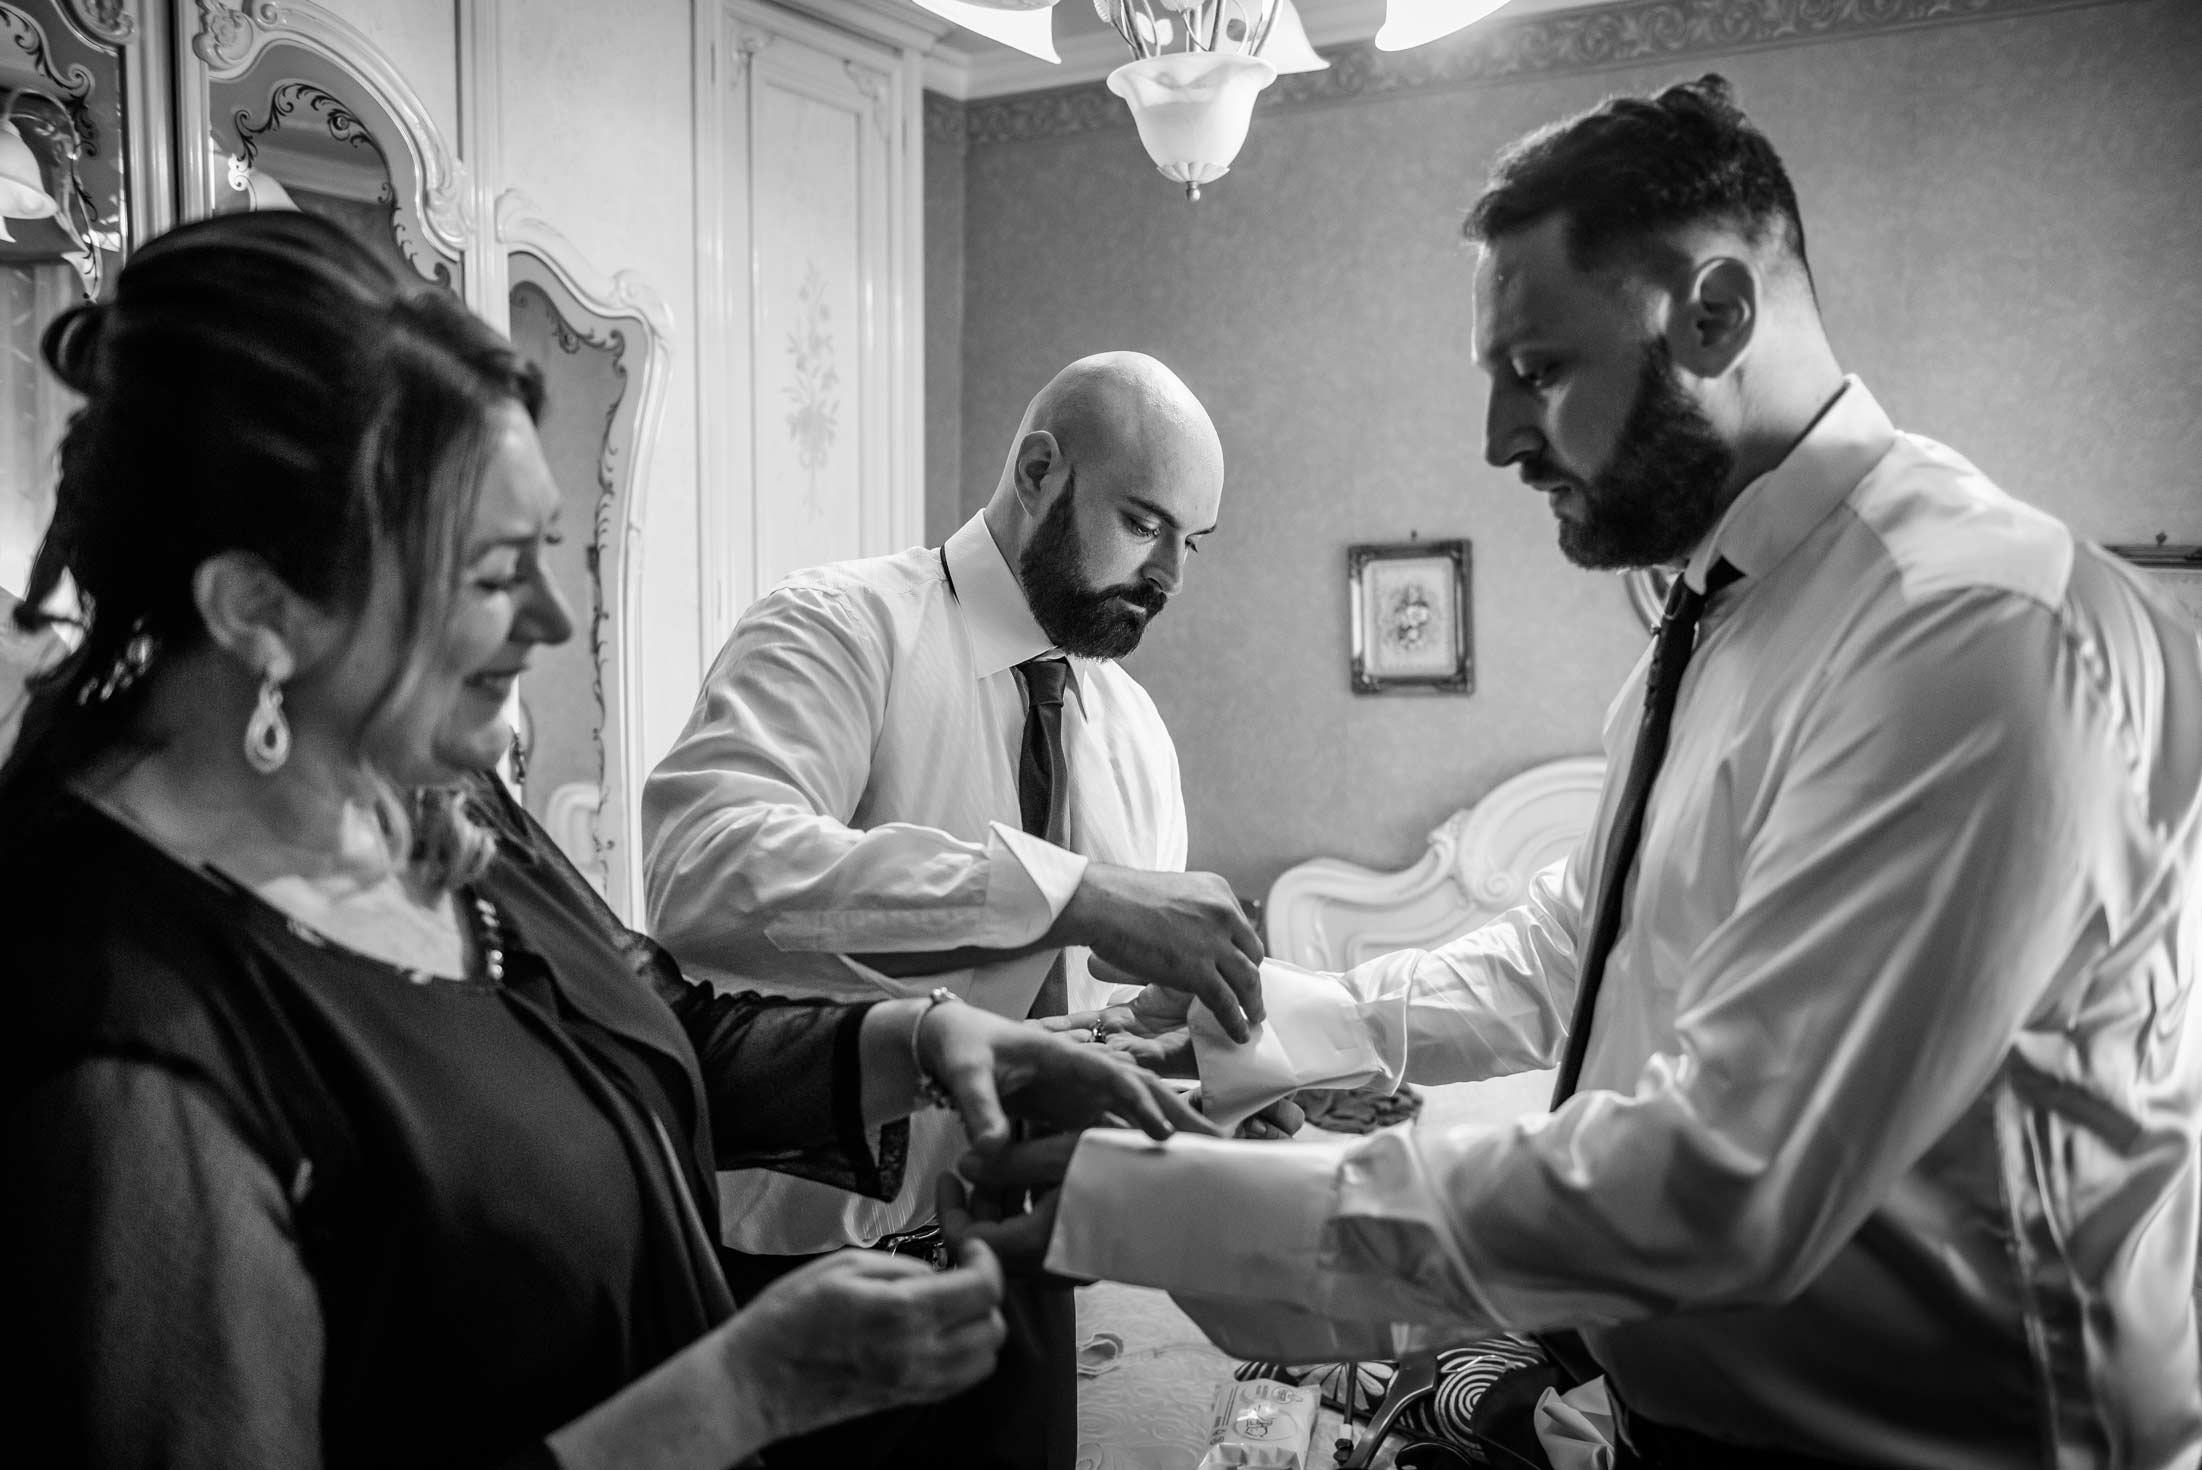 Destination-Wedding-Italy-Documentary-Wedding-Photography-Groom